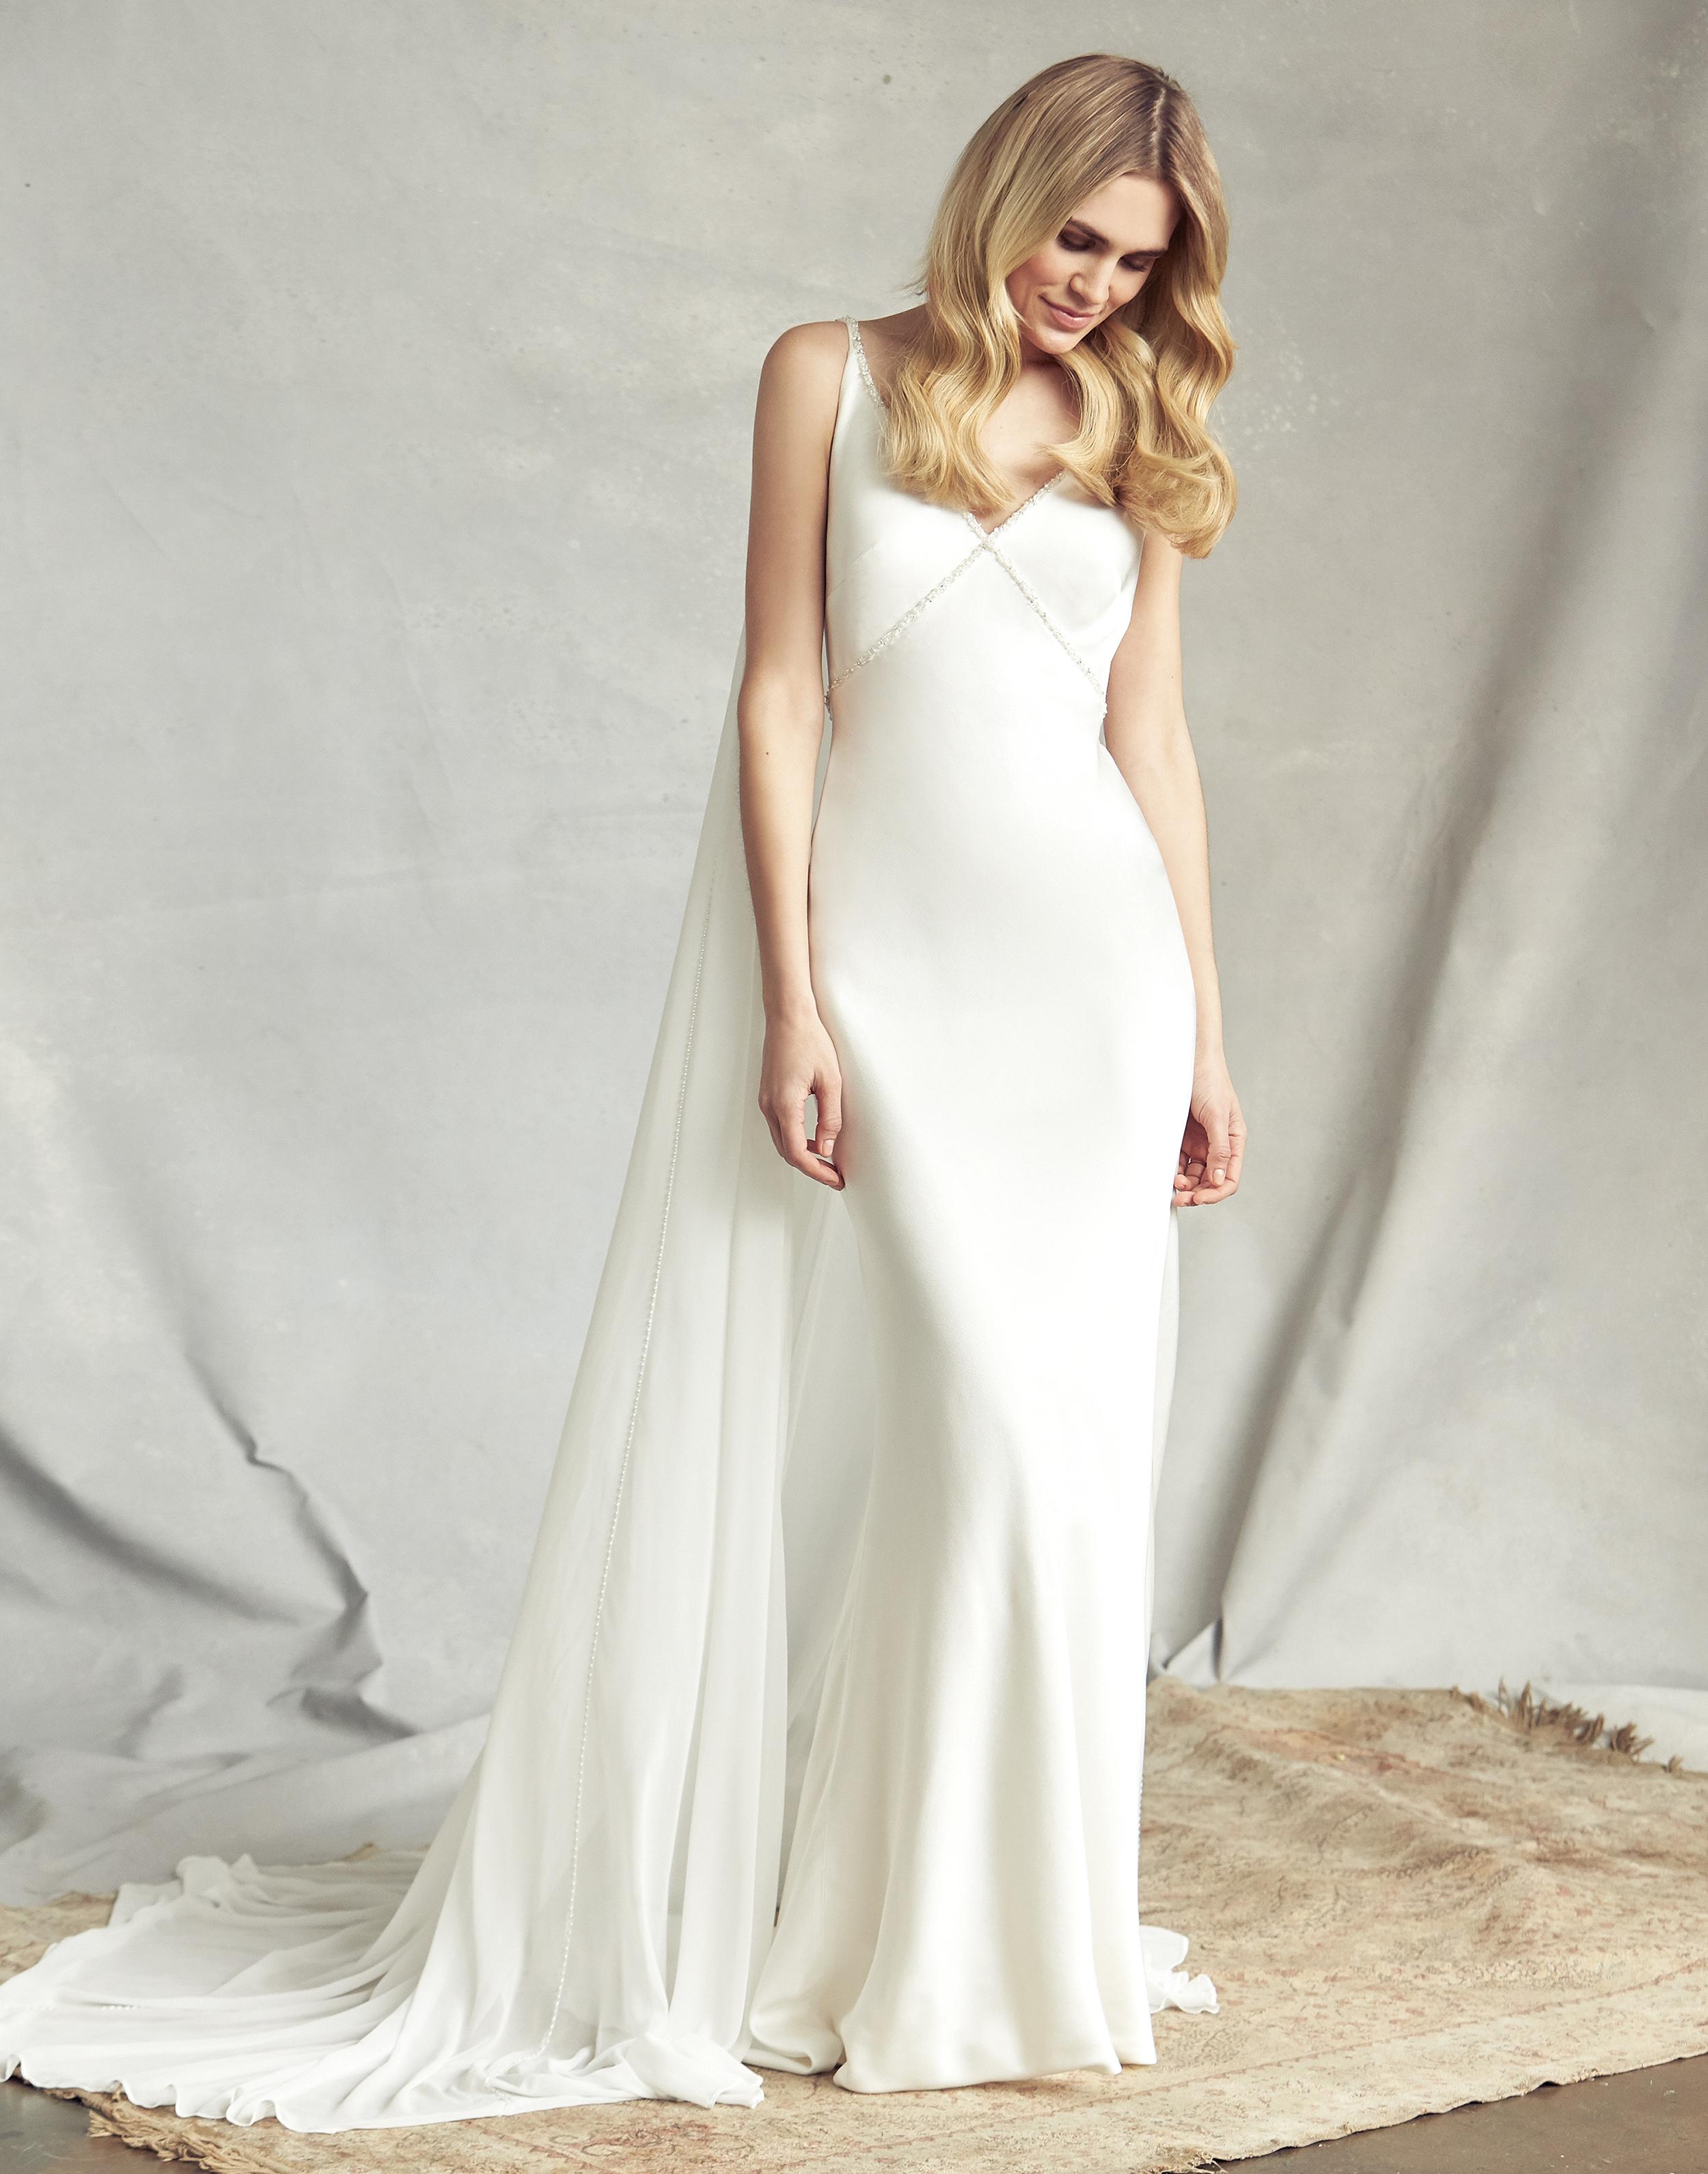 savannah miller spaghetti strap mermaid wedding dress spring 2020